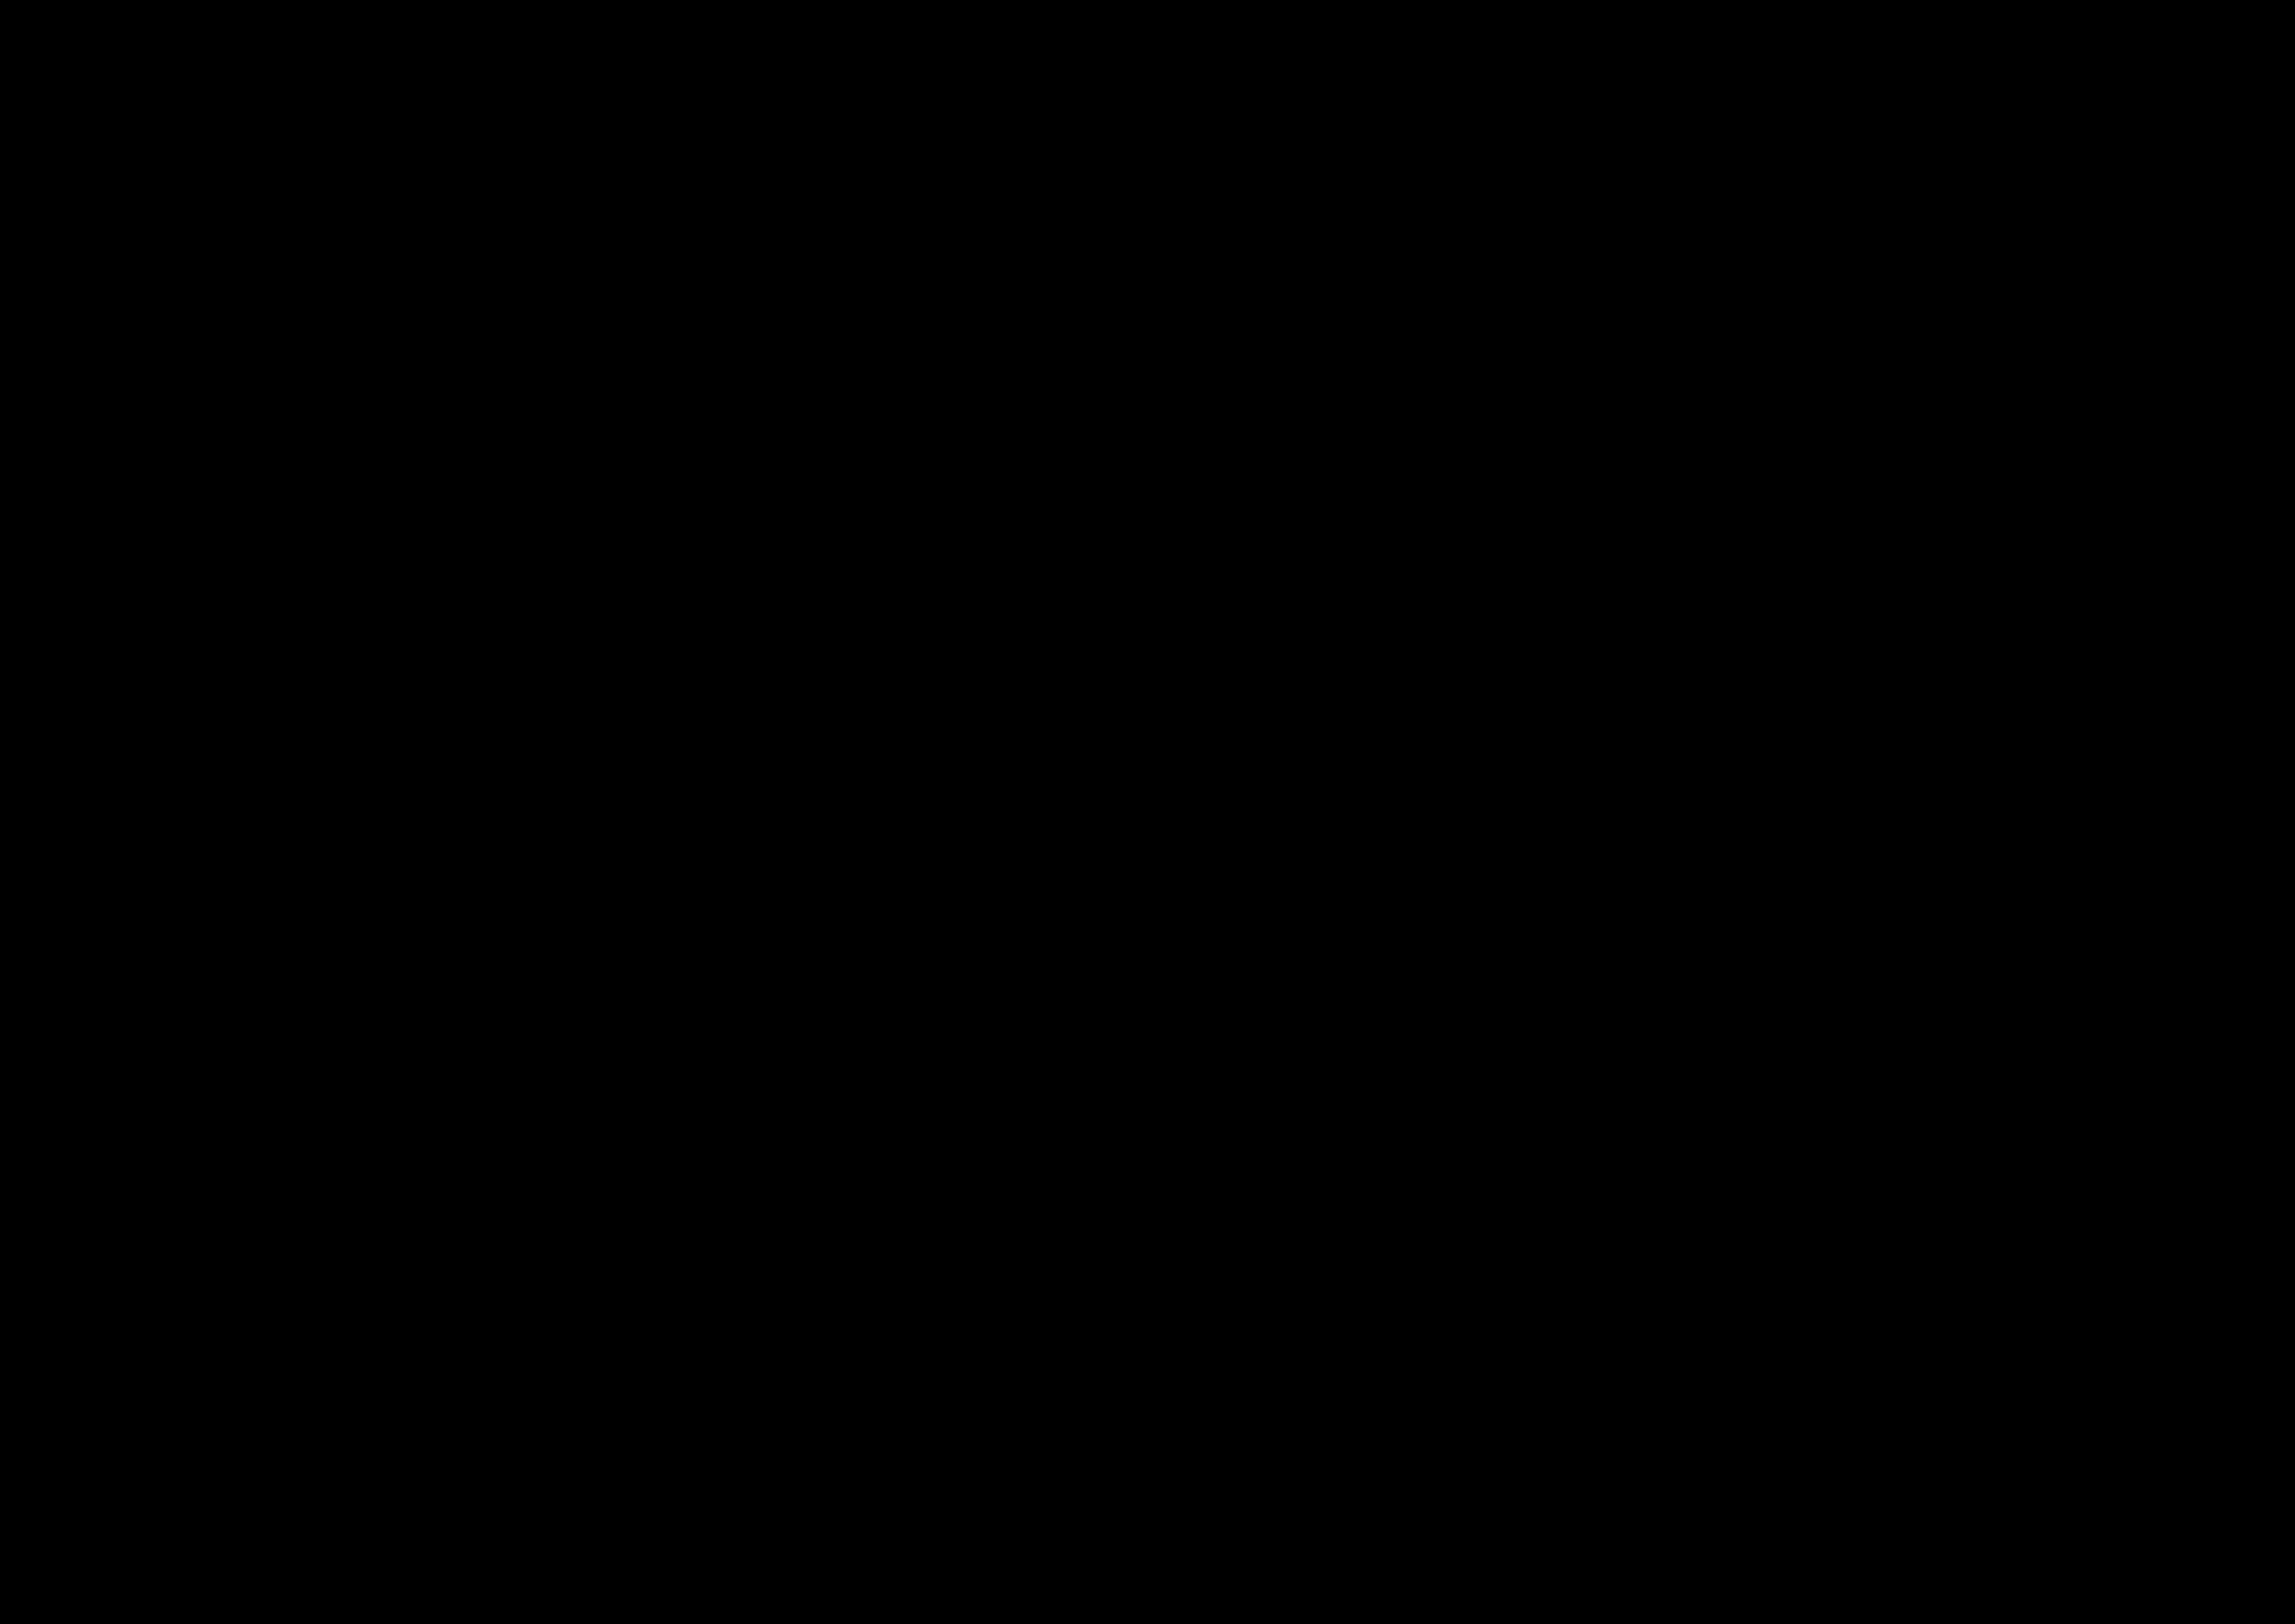 0001-8